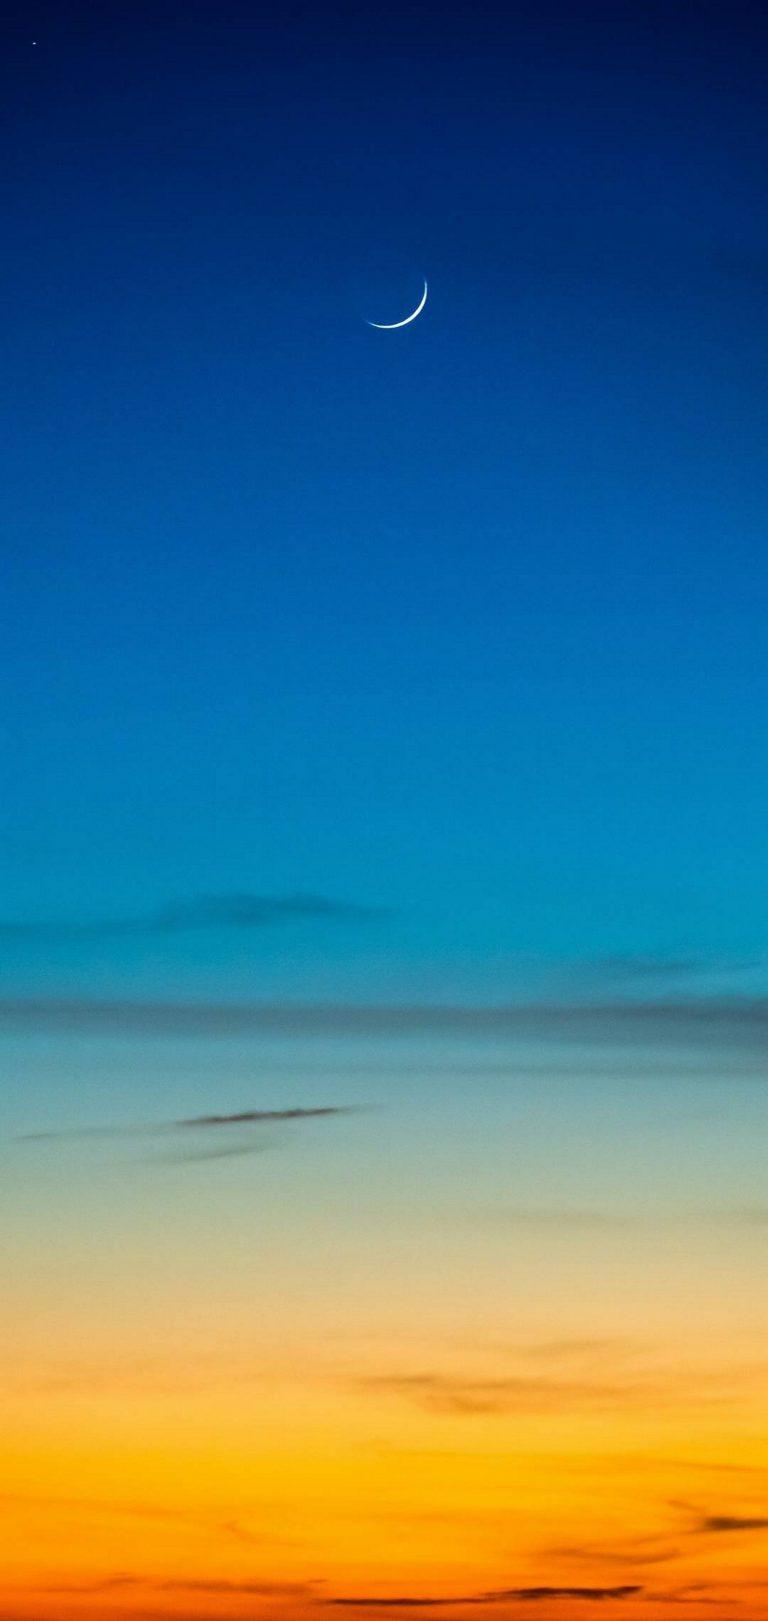 Moon Clouds Nature Wallpaper 1440x3040 768x1621